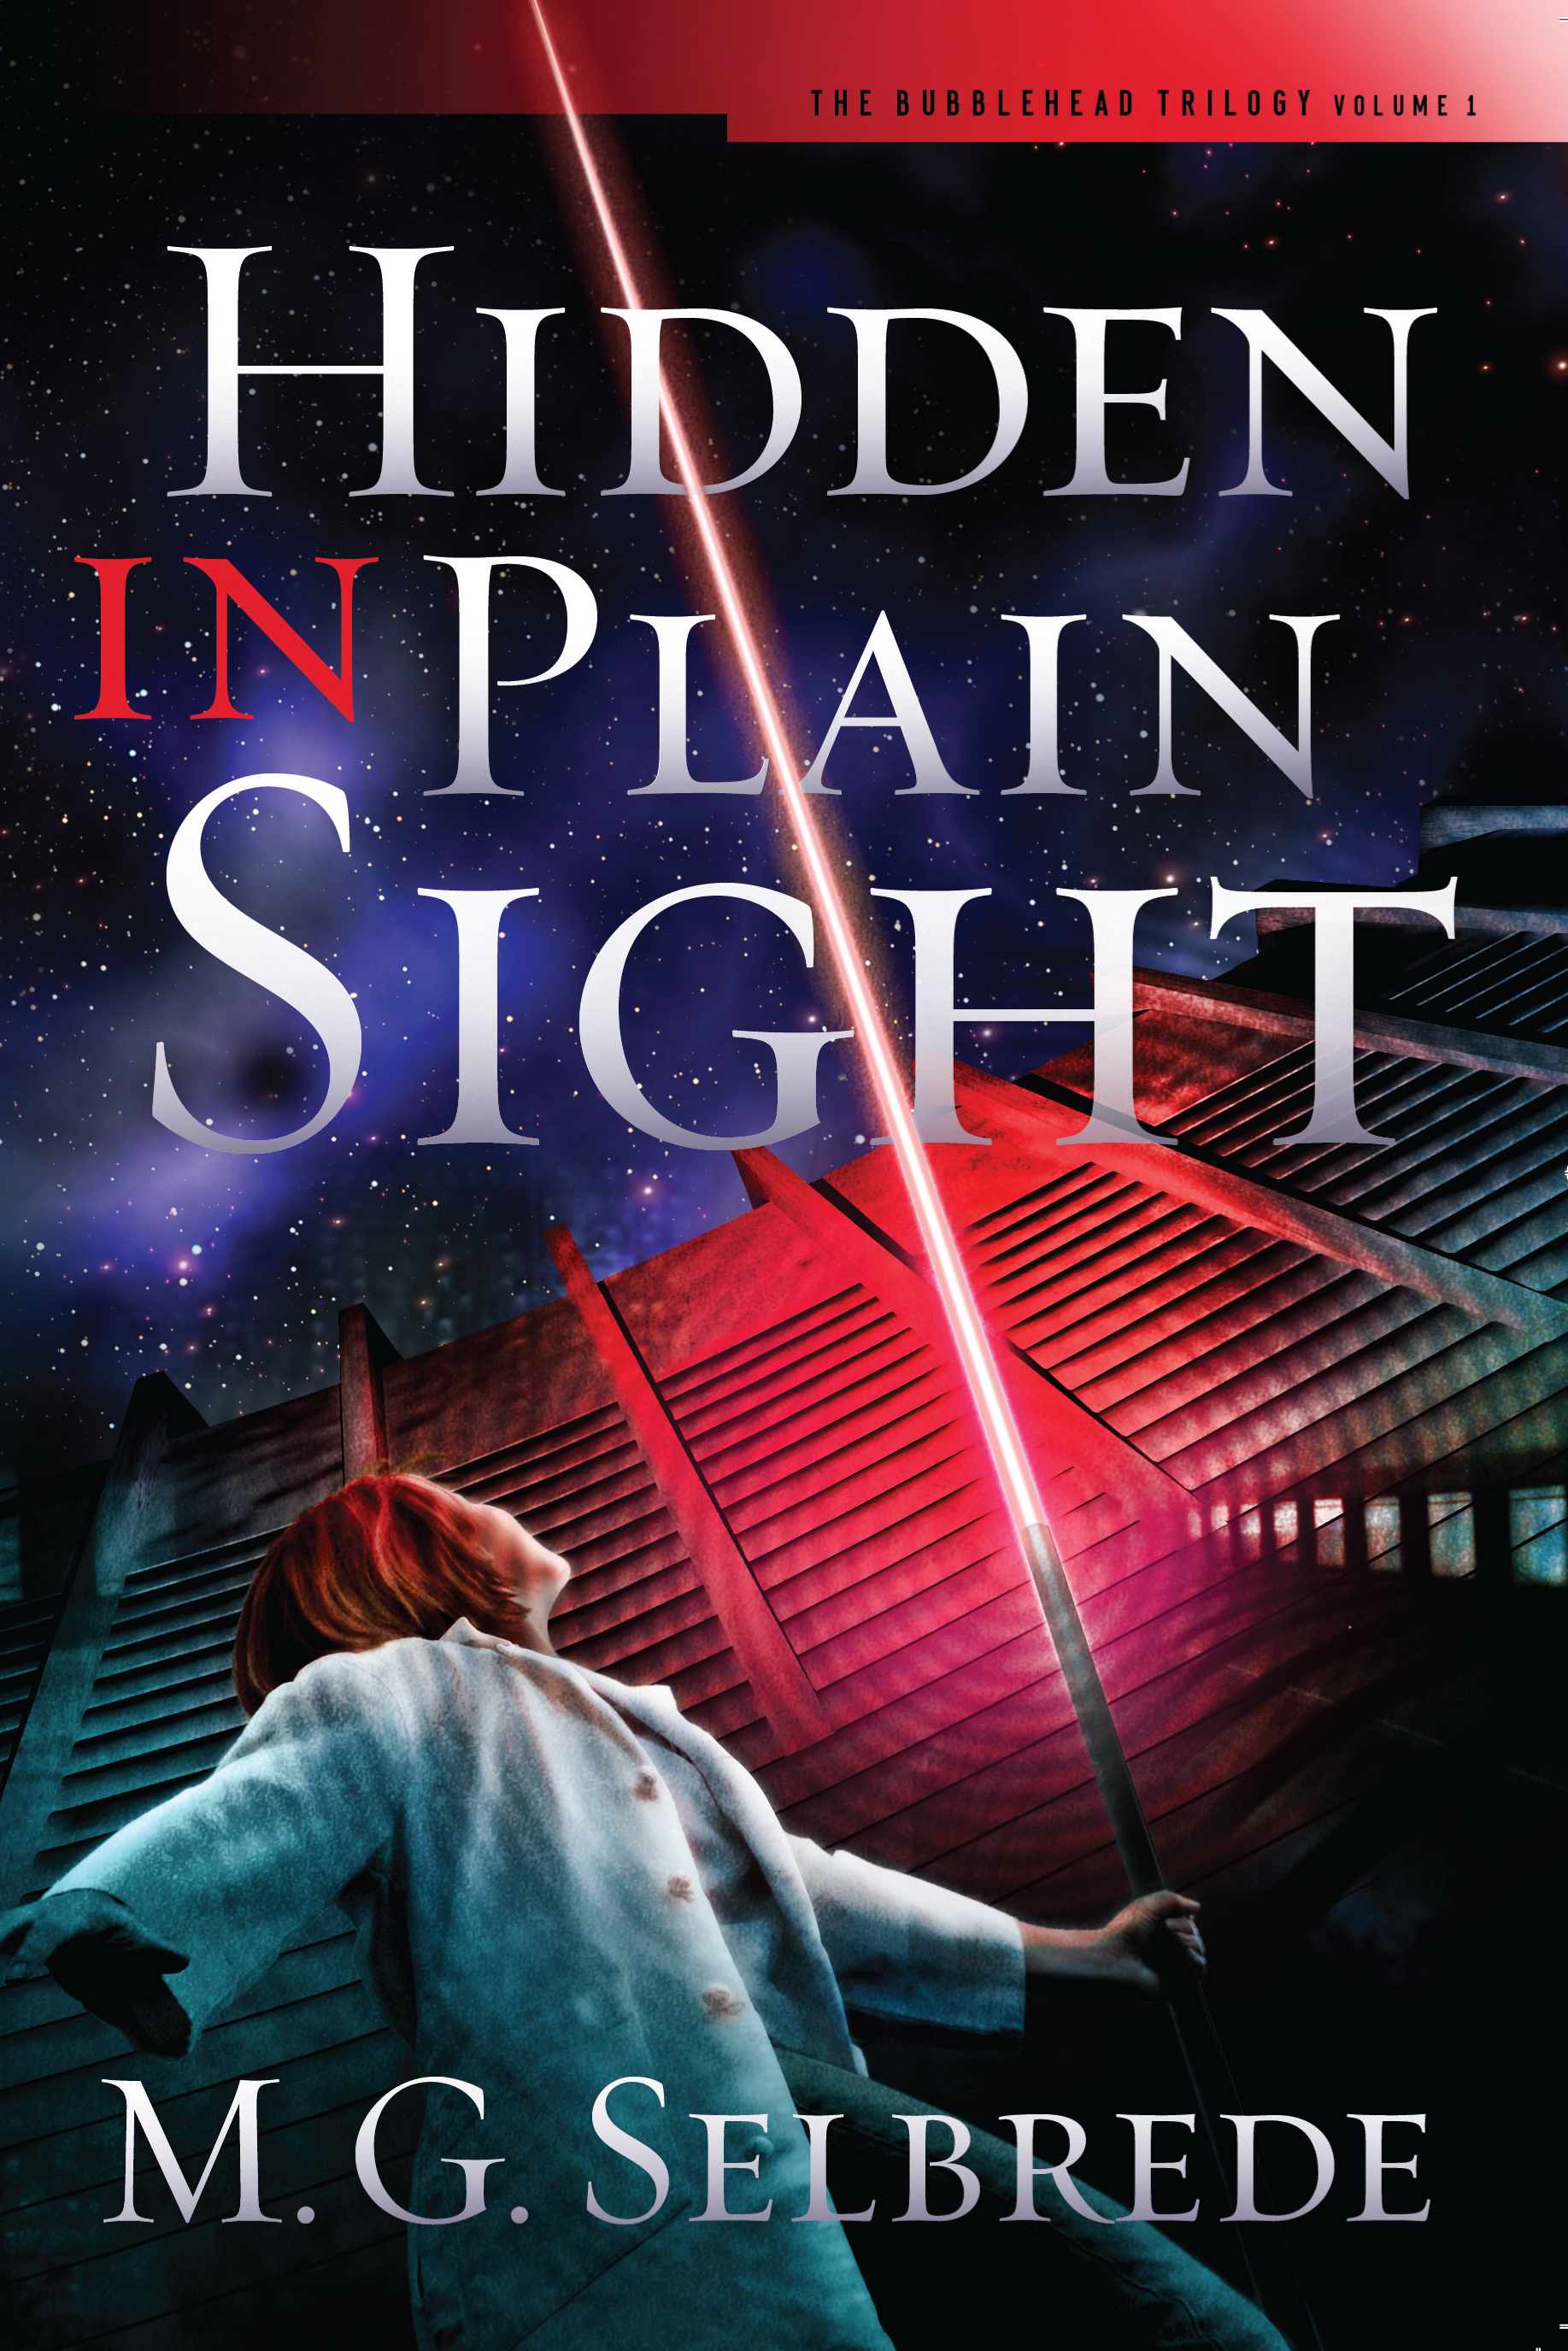 Hidden In Plain Sight (Bubble Head Series #1)